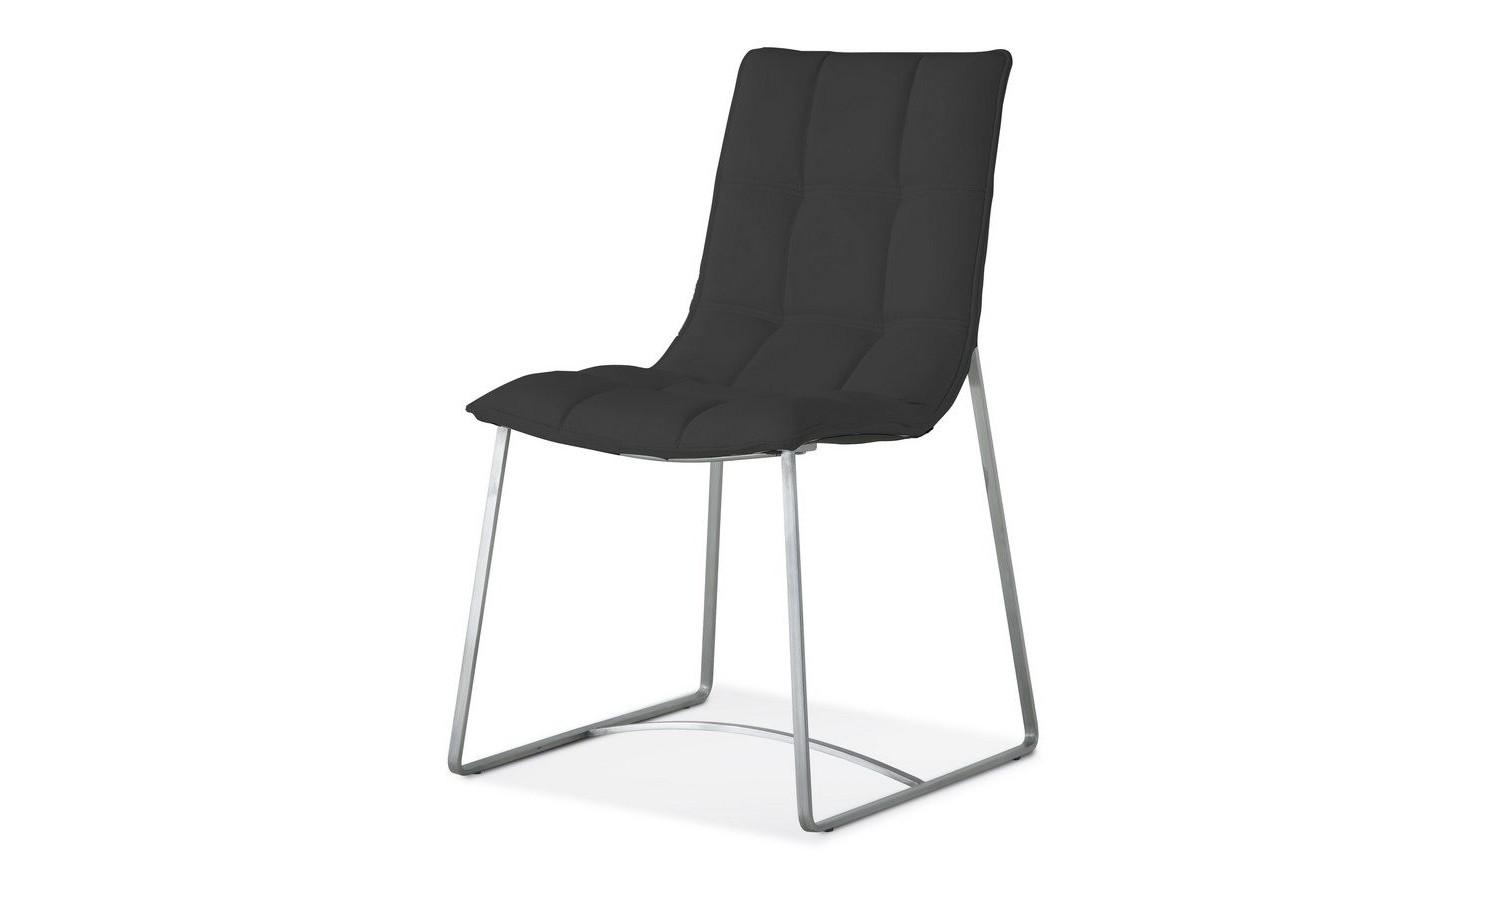 Стул BZ-500S черныйОбеденные стулья<br><br><br>Material: Кожа<br>Width см: 47<br>Depth см: 59<br>Height см: 87